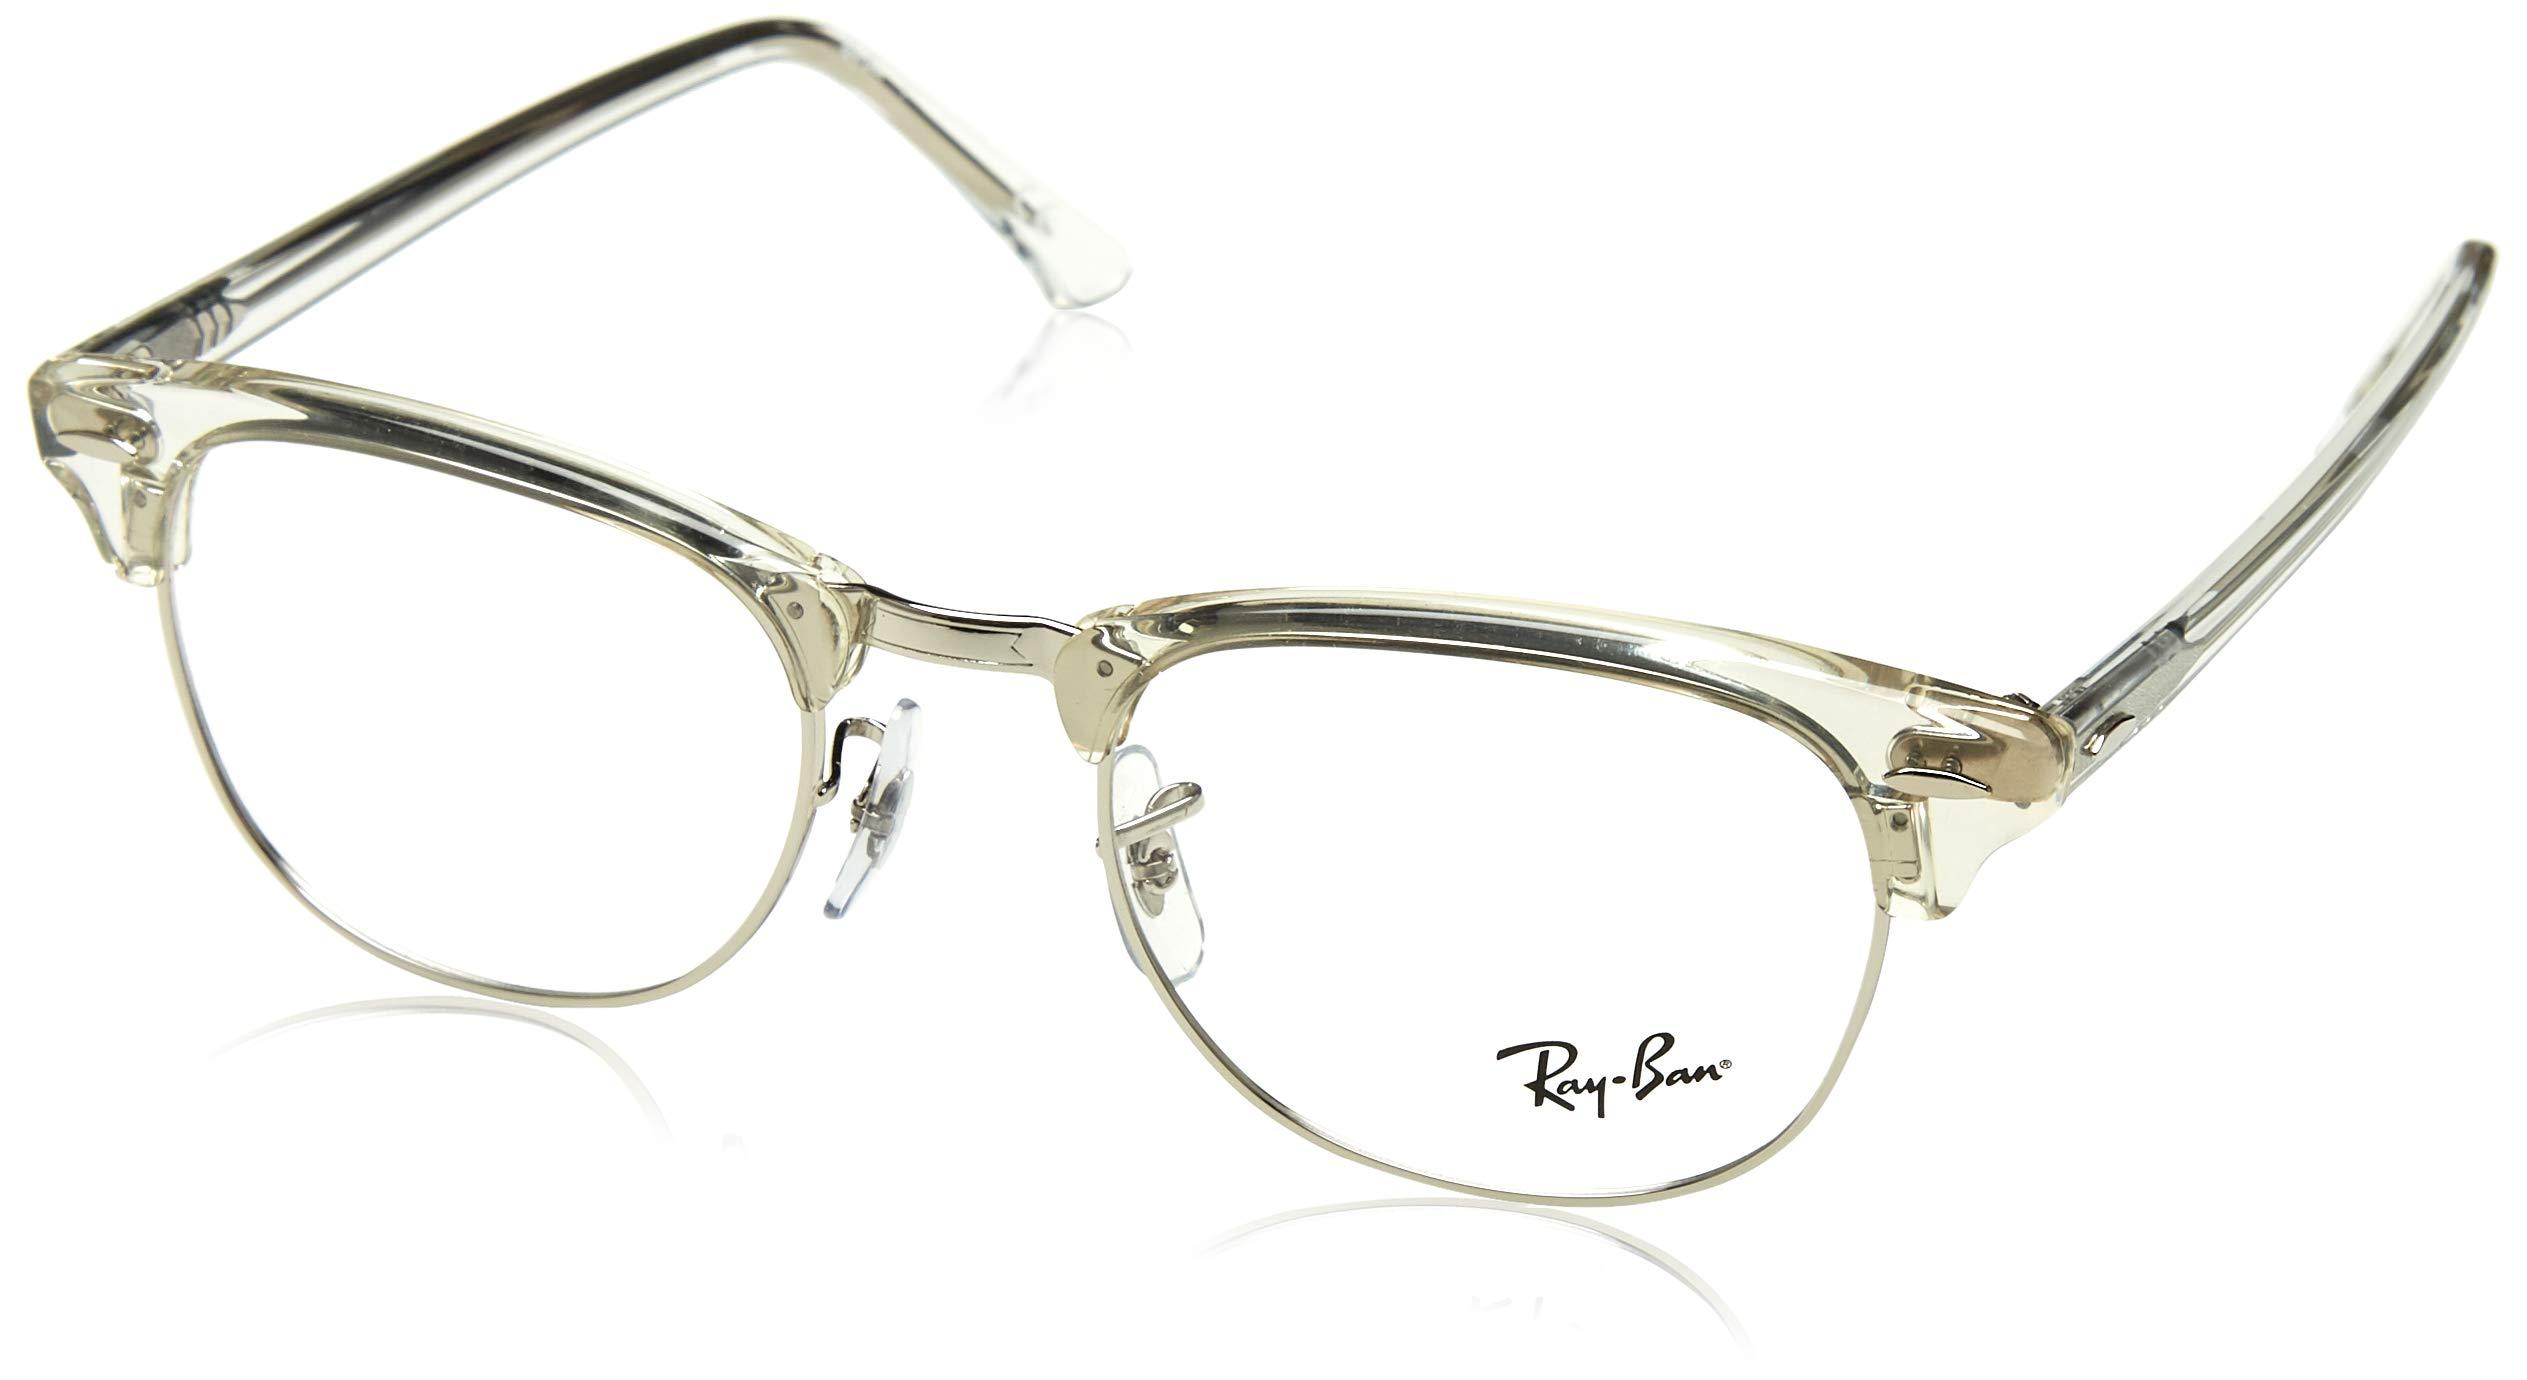 Ray-Ban Clubmaster No Polarization Square Prescription Eyewear Frame White Transparent 51 mm